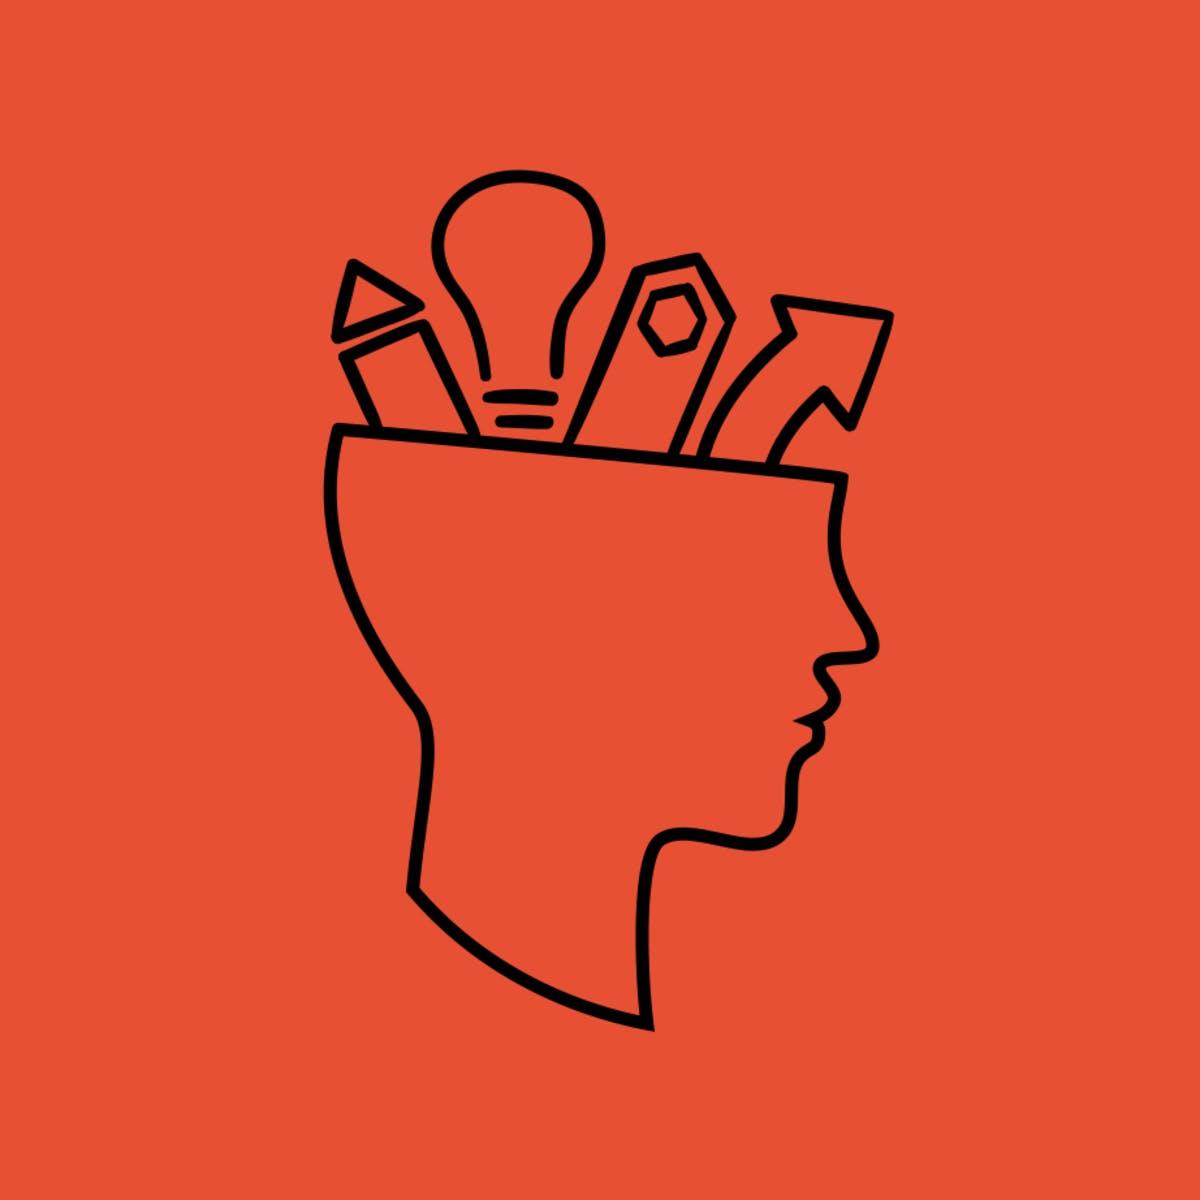 Innovation Through Design: Think, Make, Break, Repeat